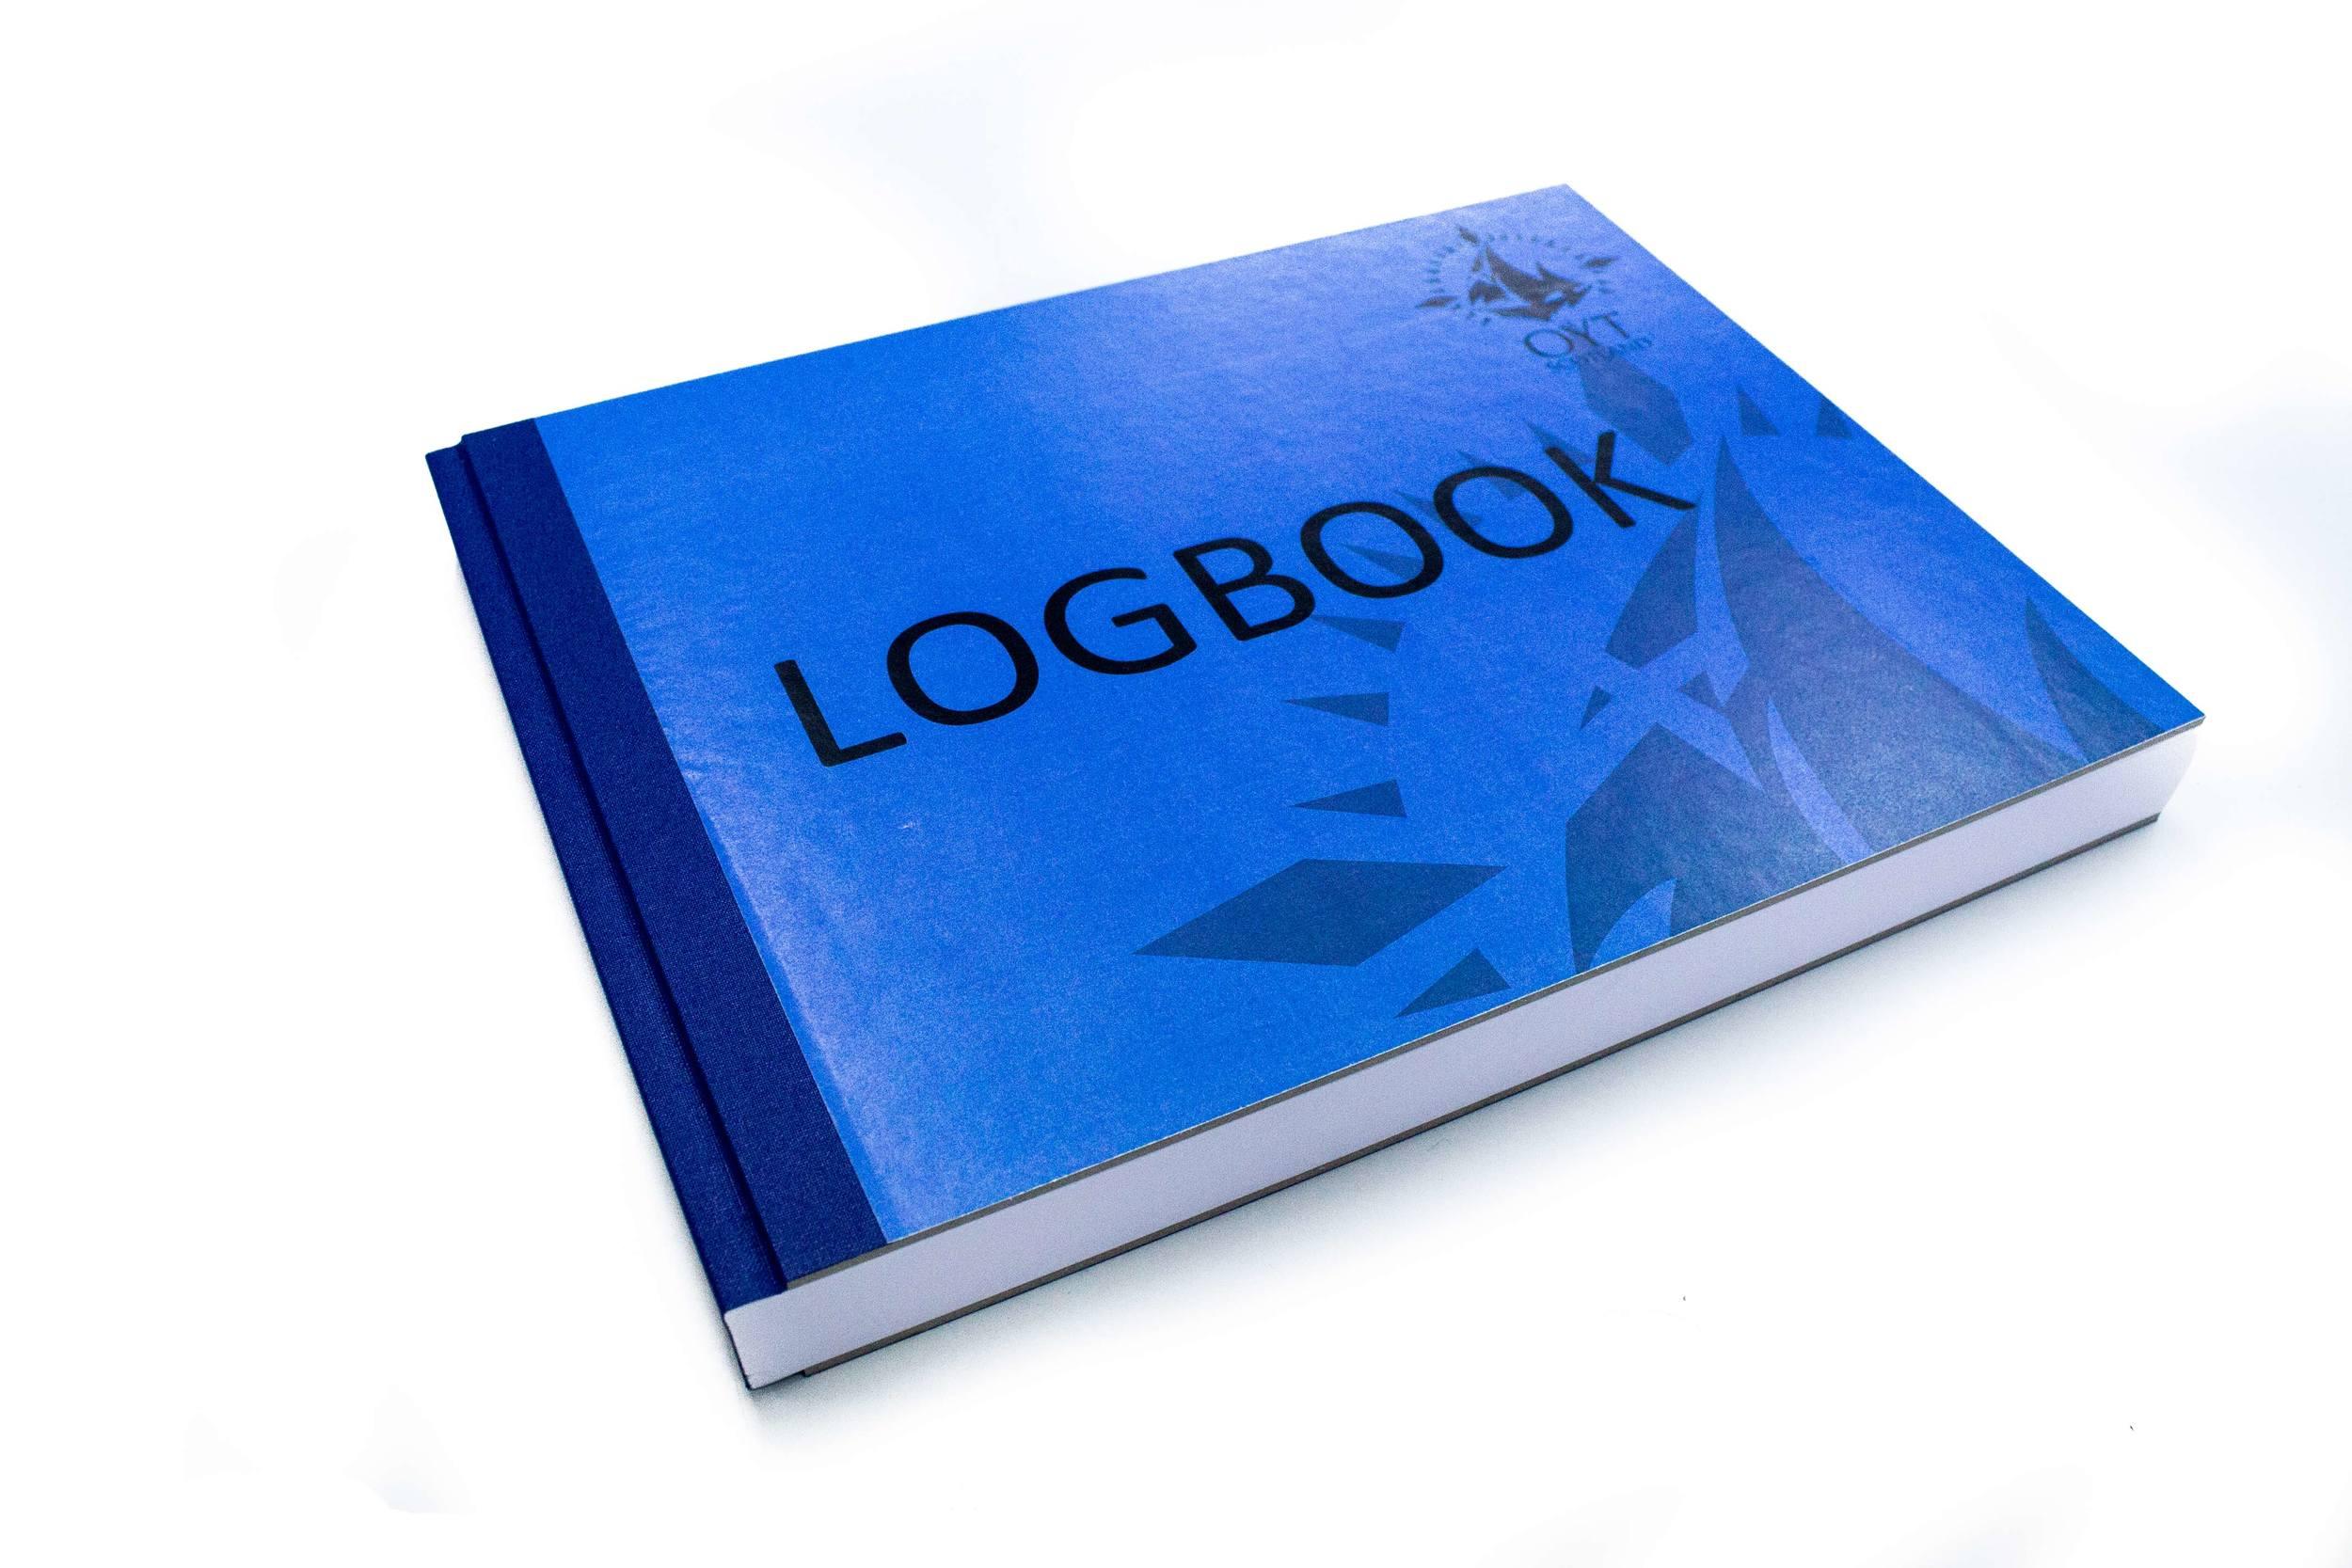 Small run book log book